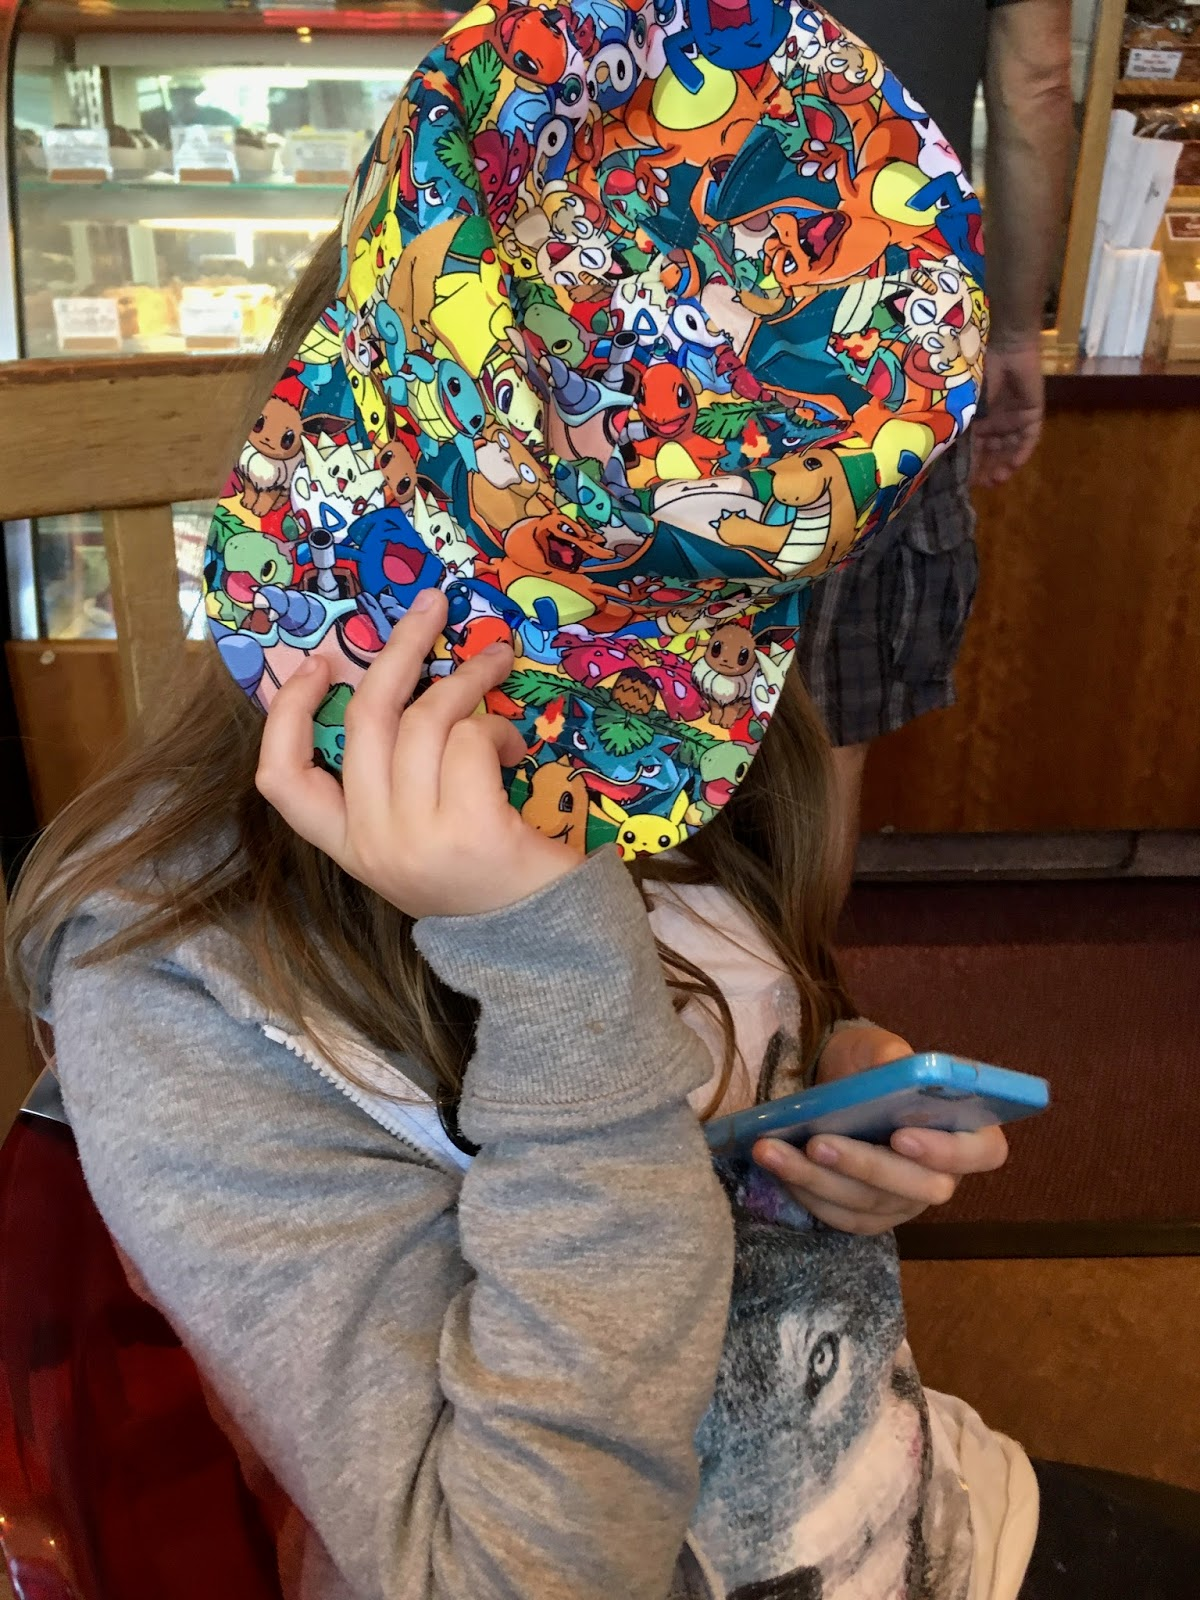 Child hiding behind a hat